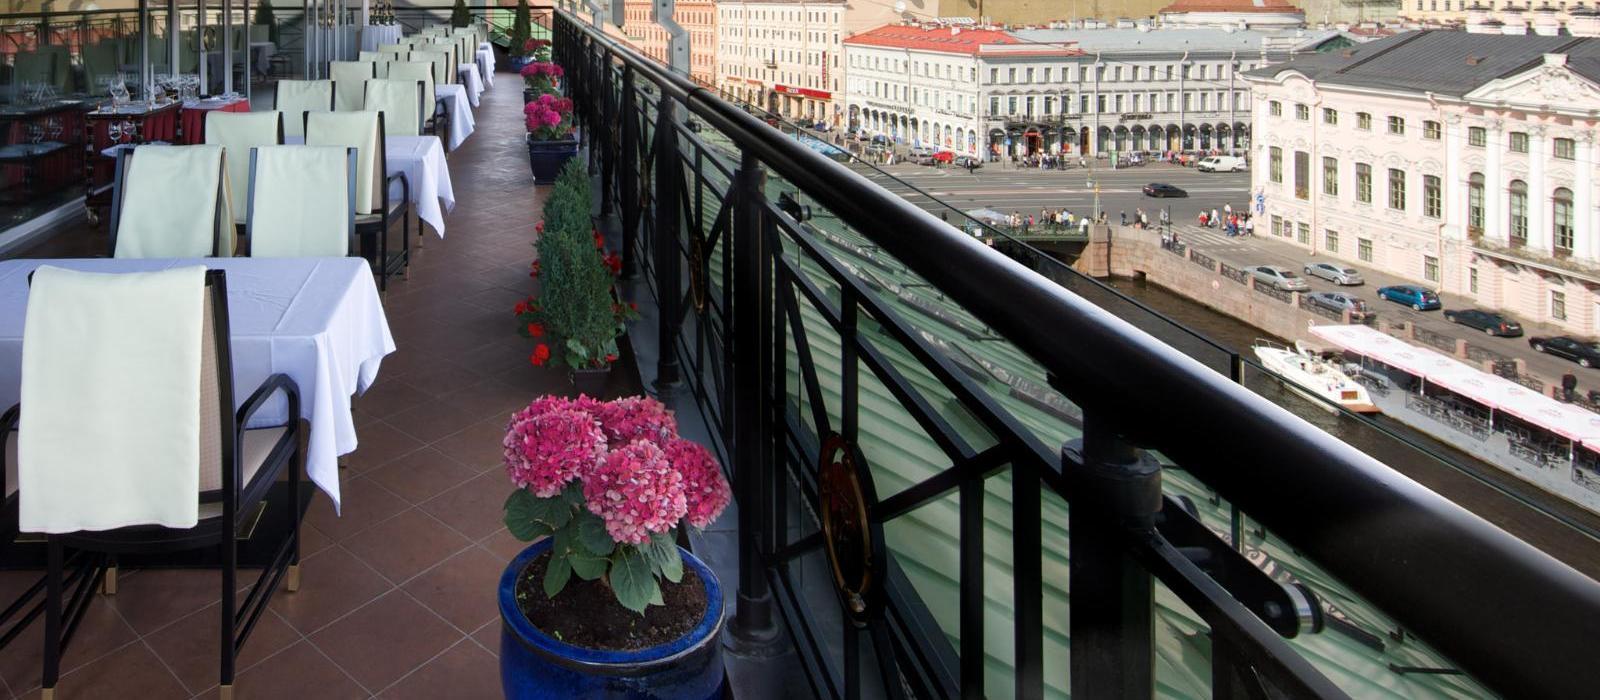 塔伦帝国酒店(Taleon Imperial Hotel) 图片  www.lhw.cn